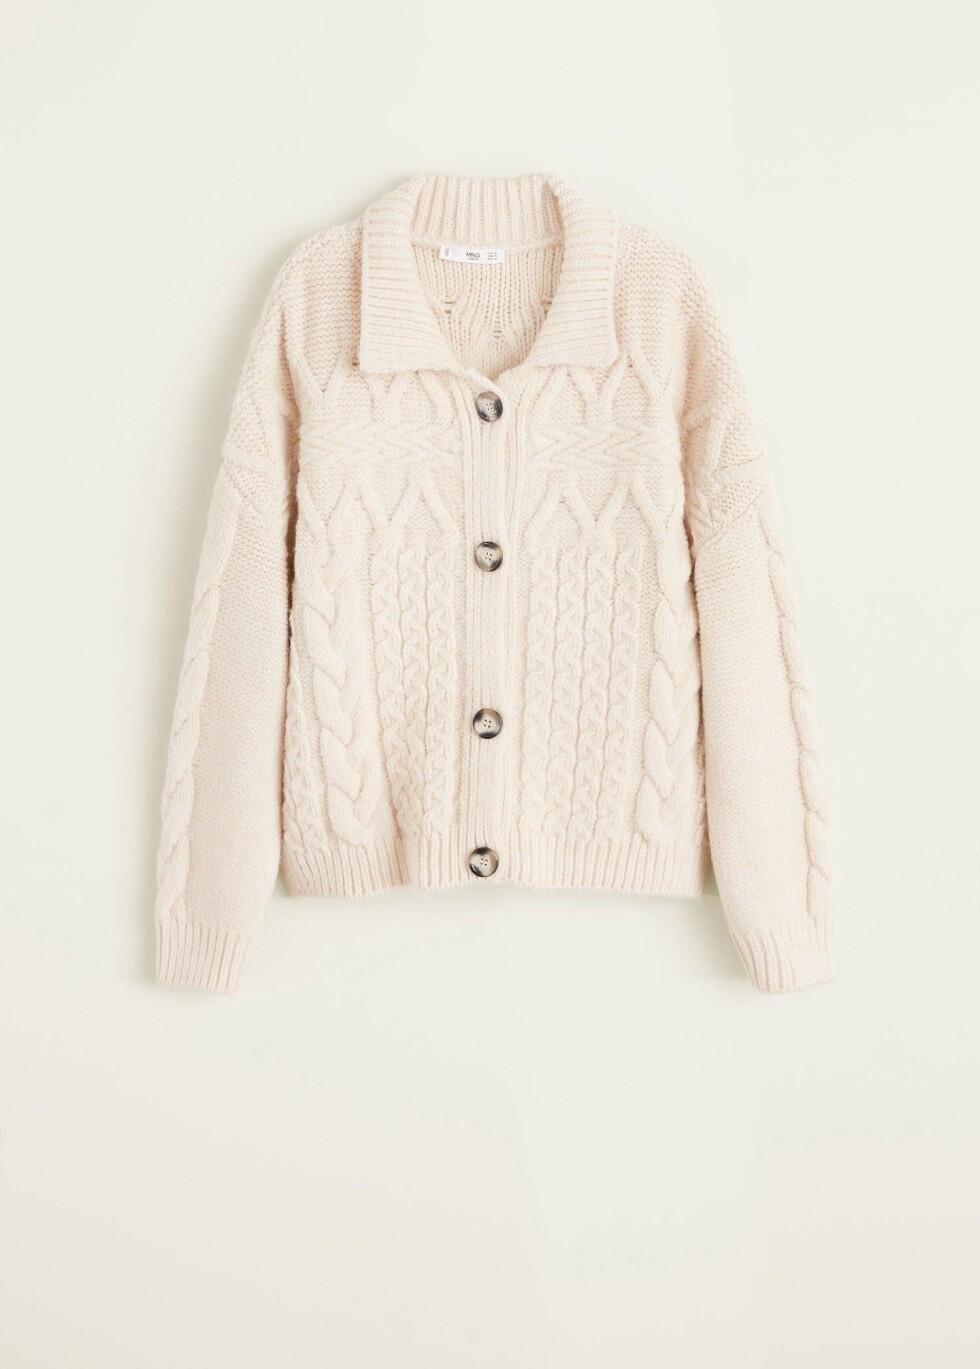 Kardigan fra Mango |299,-| https://shop.mango.com/no-en/women/cardigans-and-sweaters-cardigans/chunky-knit-cardigan_33057670.html?c=05&n=1&s=Rebajas_she.familia;55,355,610,810